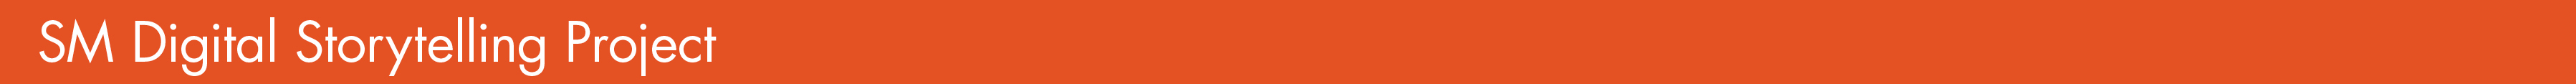 new orange SM digital